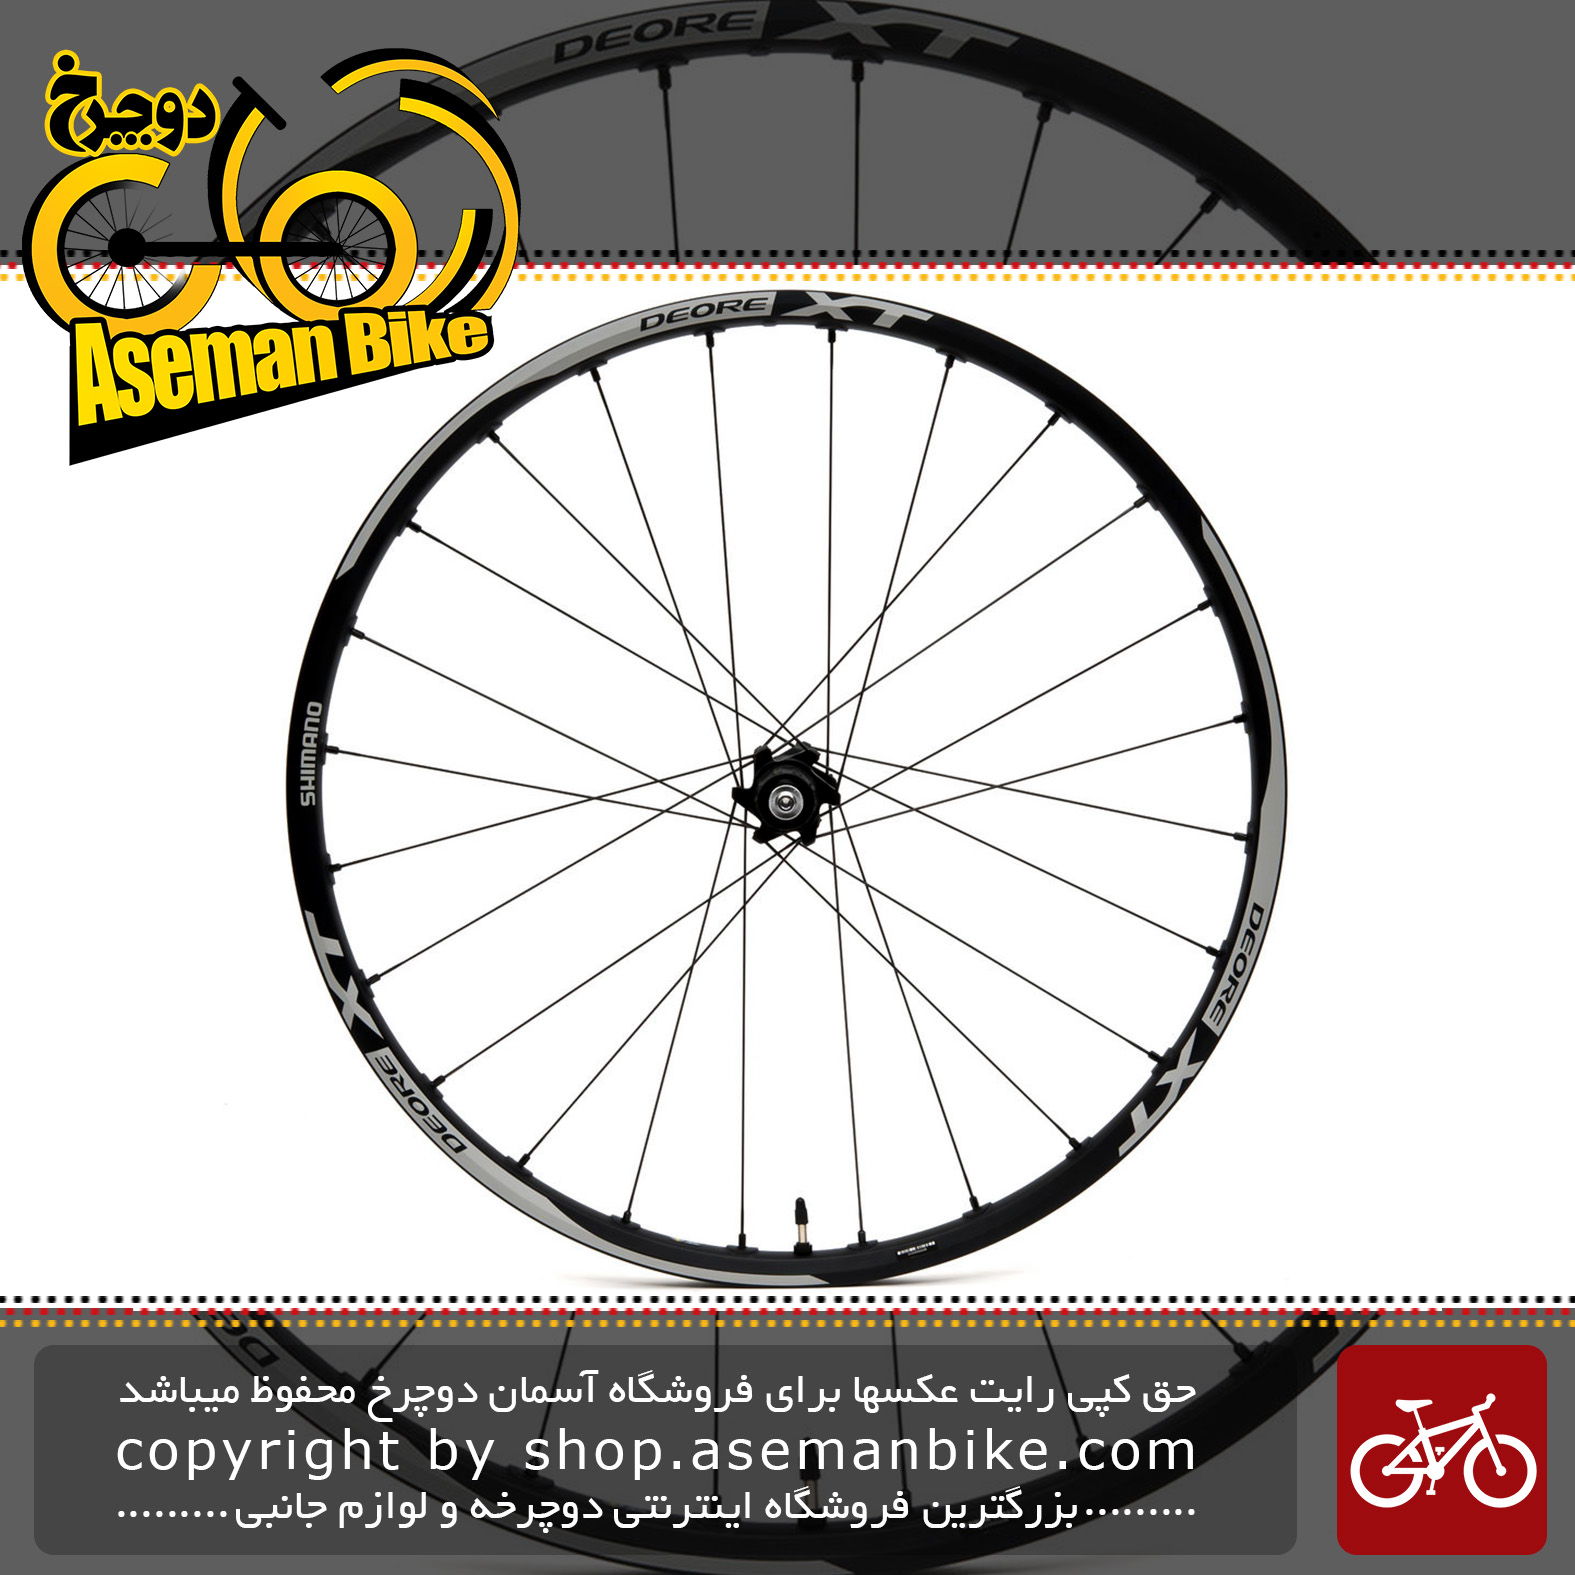 طوقه کامل تیوبلس دوچرخه شیمانو دیور ایکس تی Shimano WH-M785 DEORE XT TUBELES